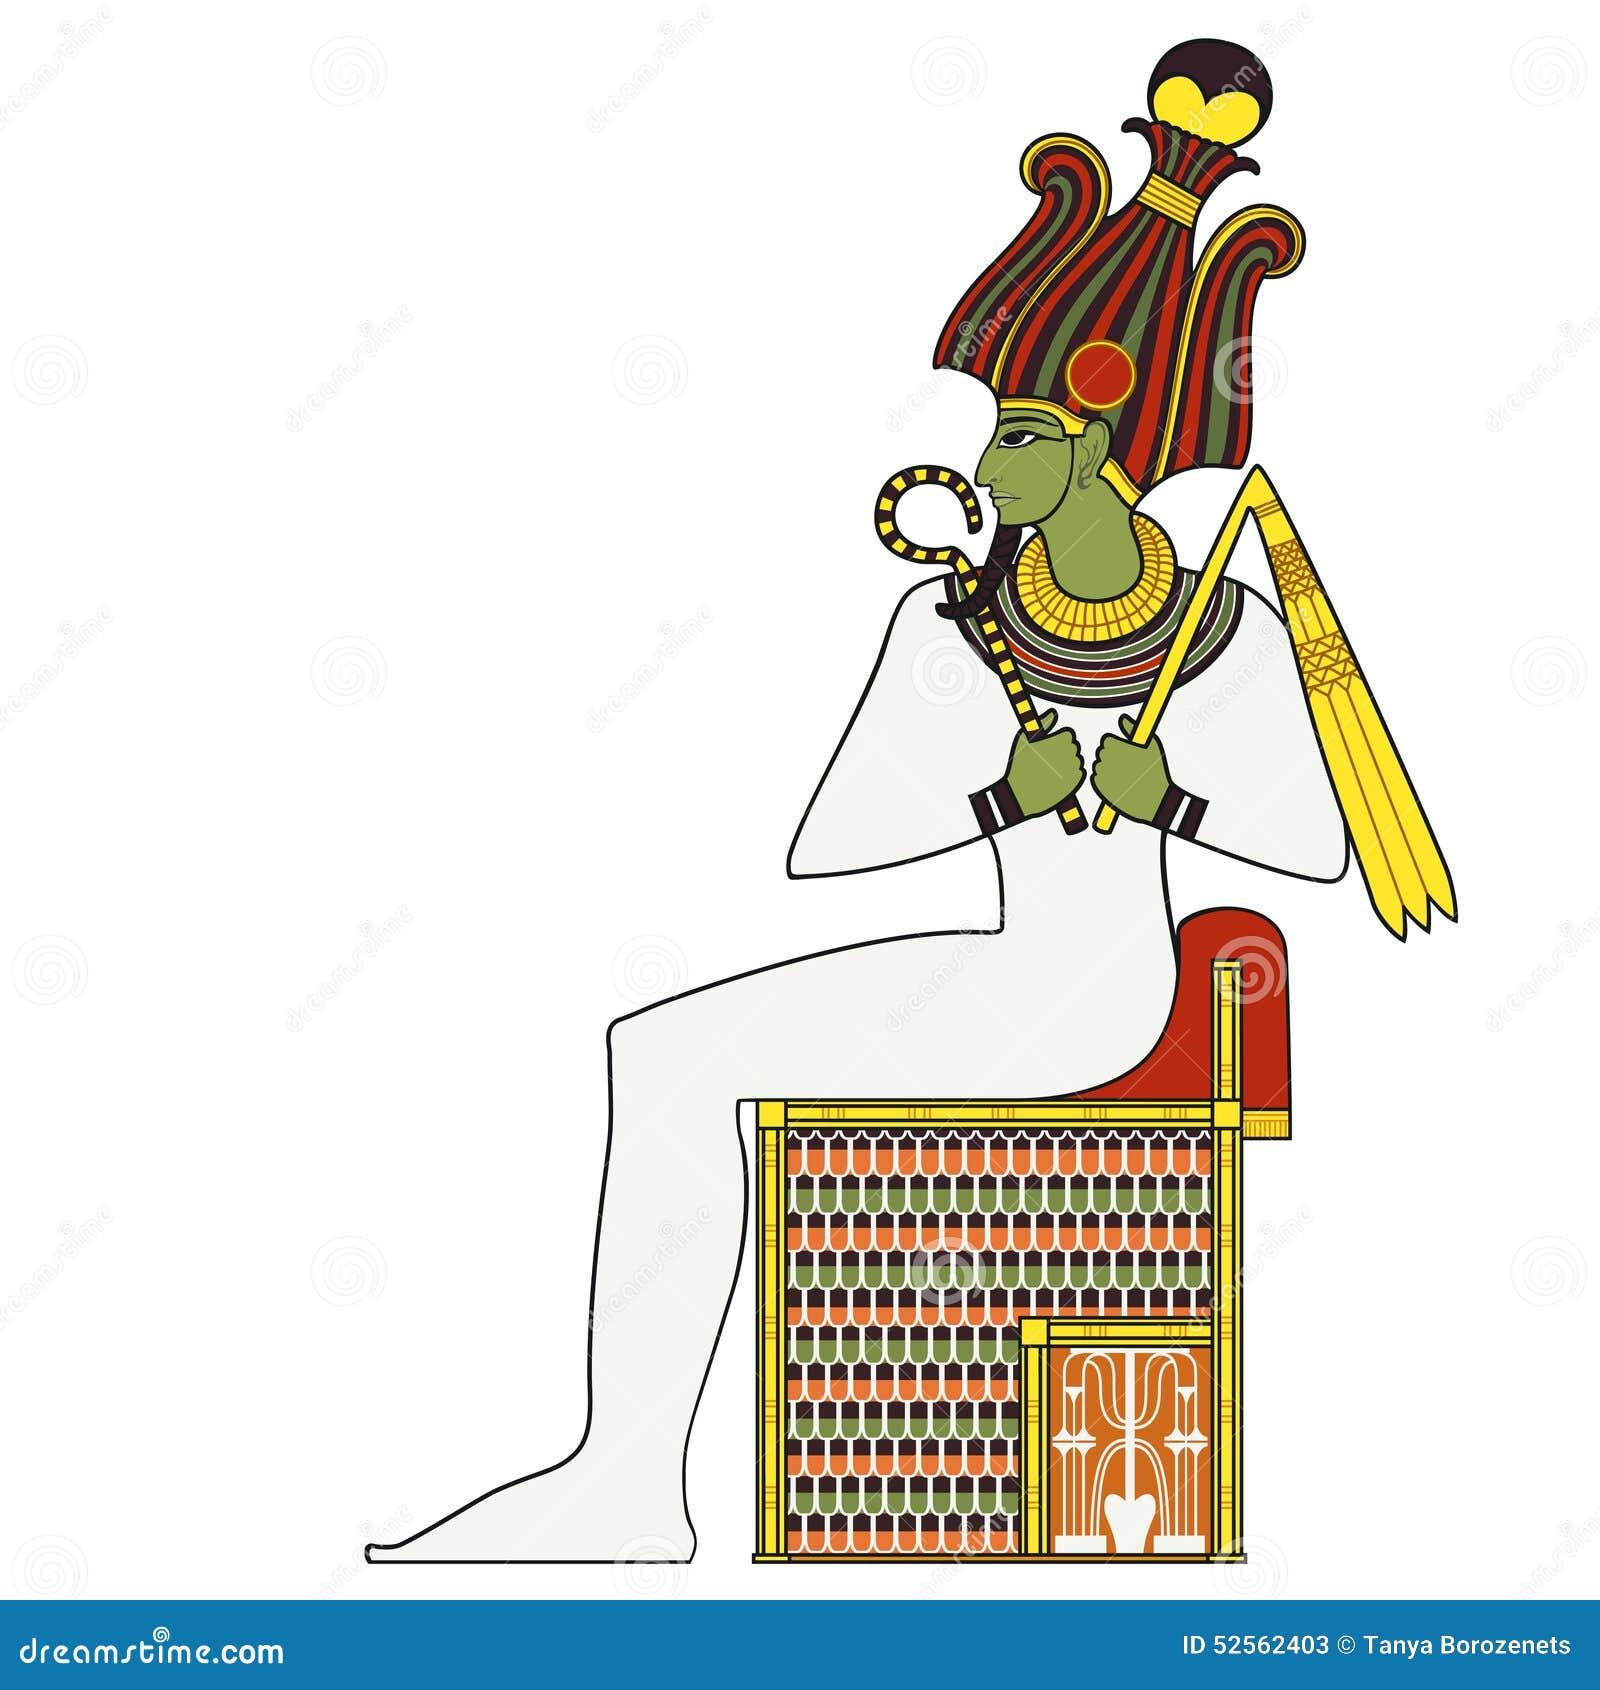 Osiris isolated figure of ancient egypt god stock vector osiris isolated figure of ancient egypt god biocorpaavc Gallery